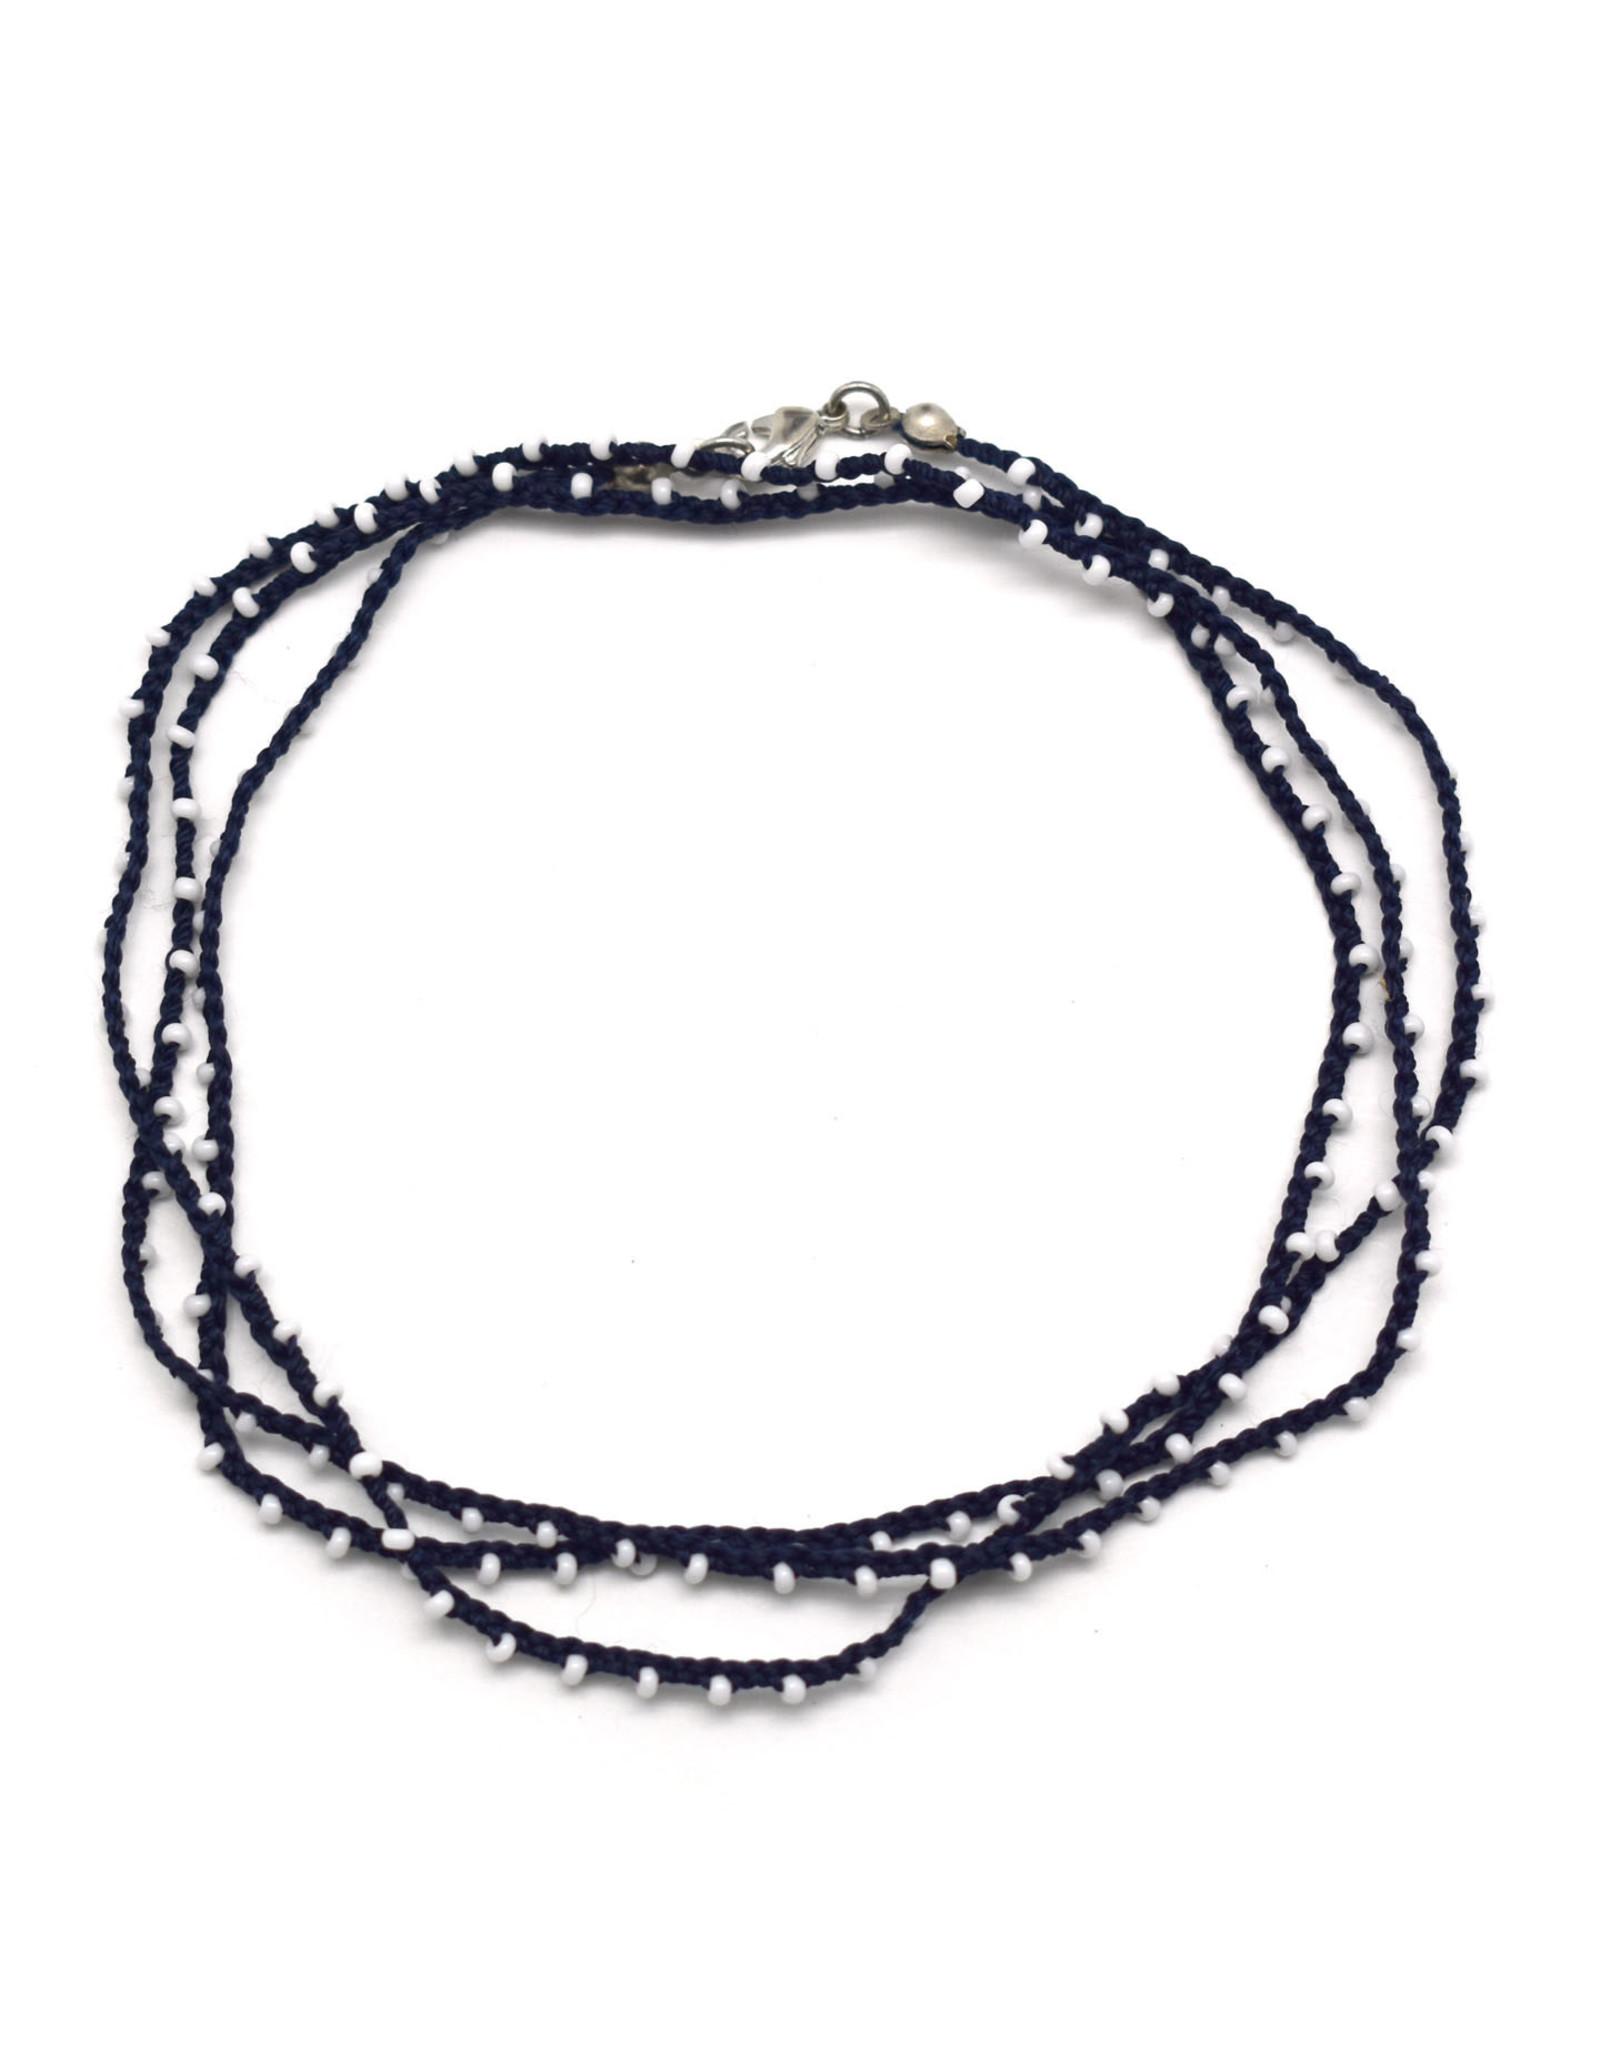 Tibet Wrap Necklace/Bracelet - Lunar